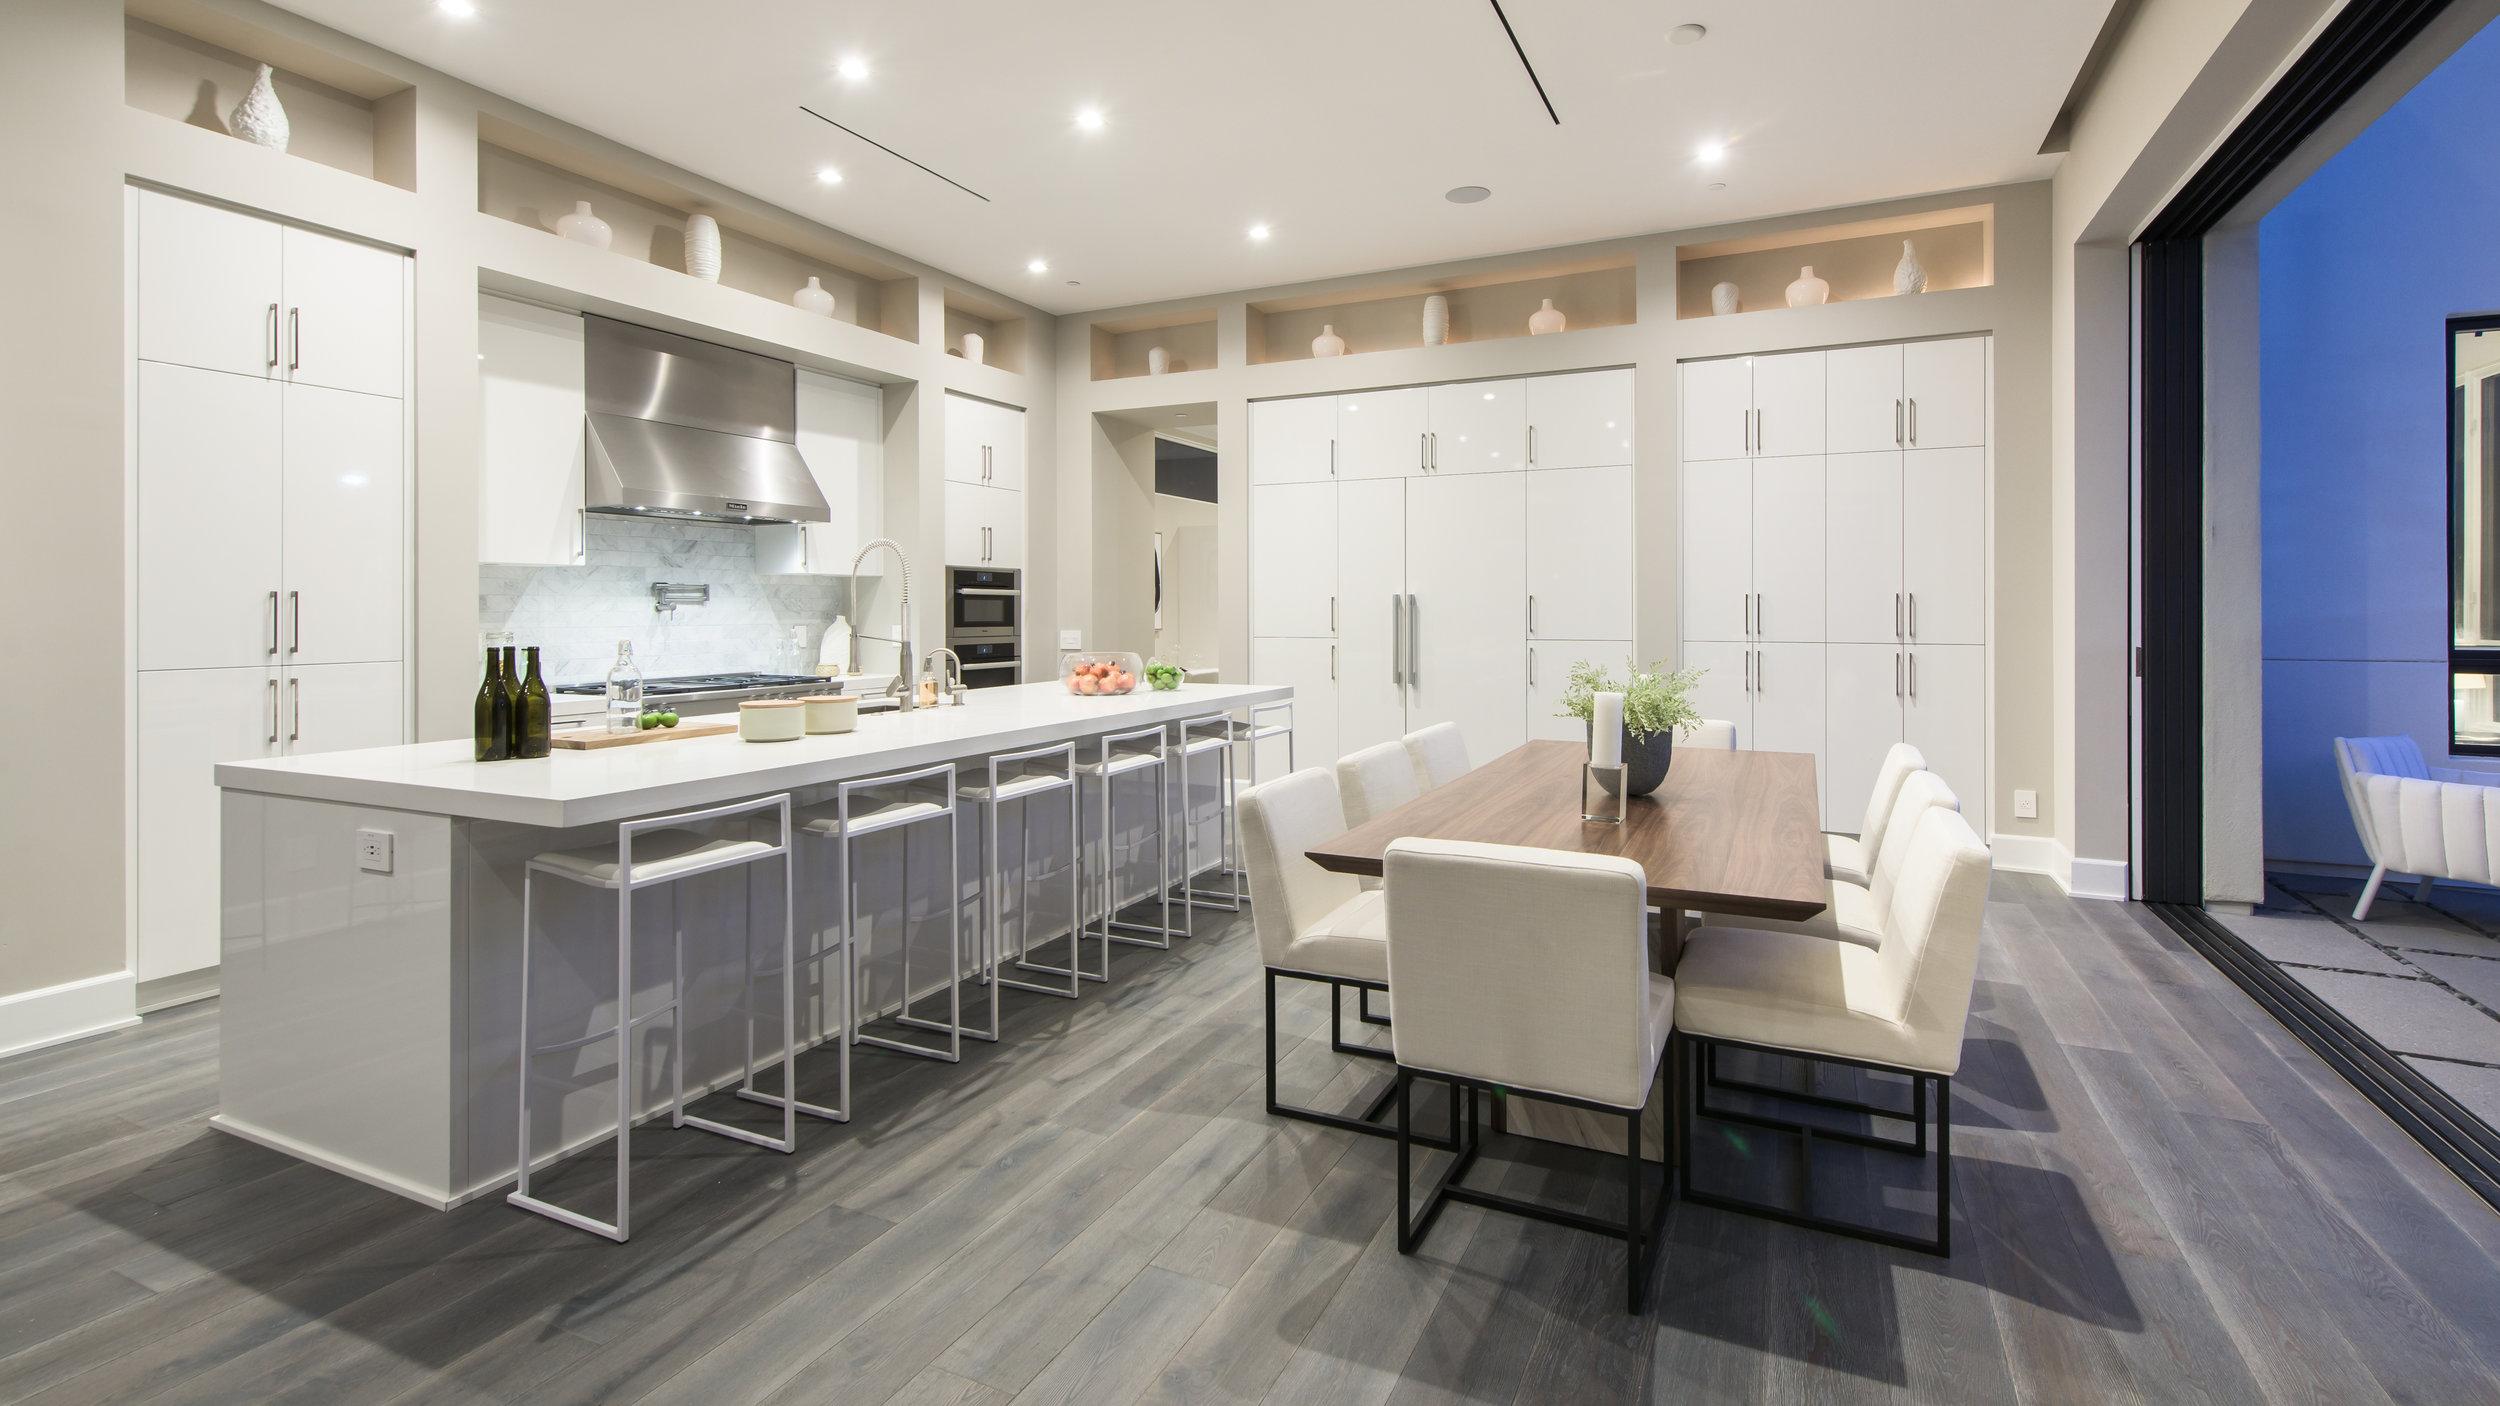 5902Firefly-print-12-Dining Kitchen.jpg